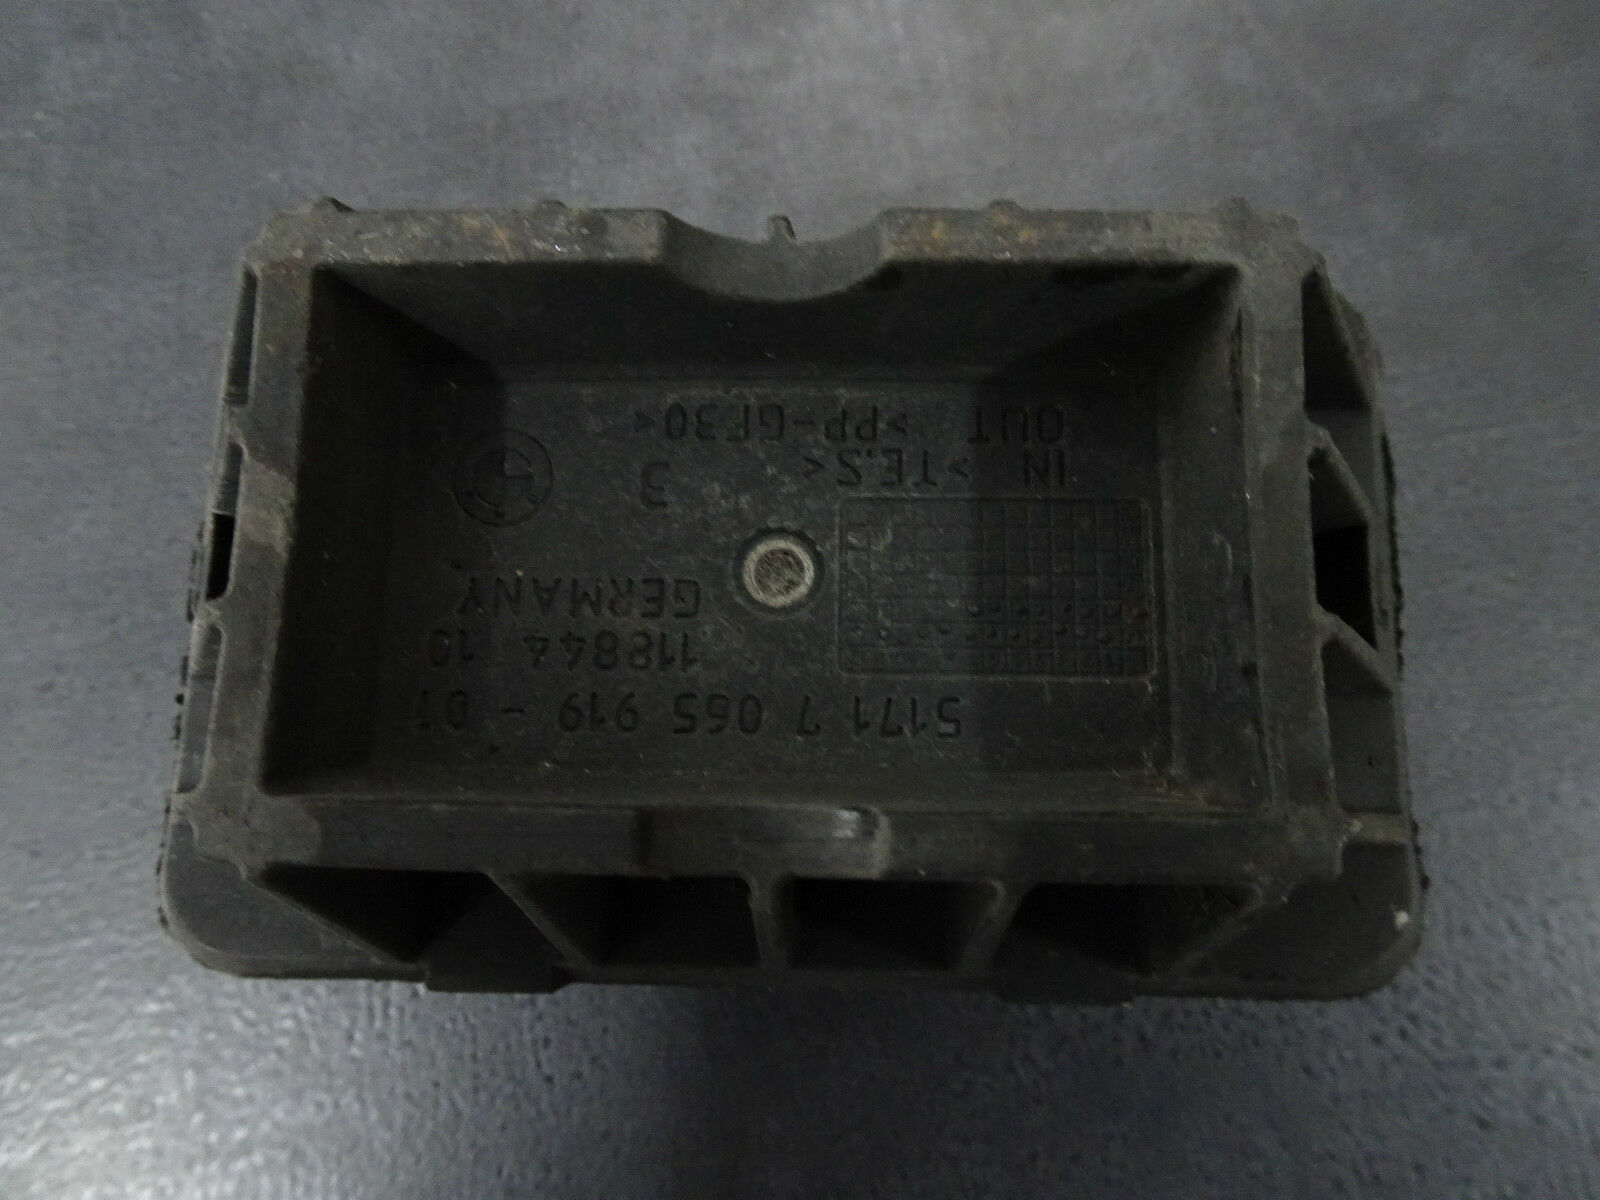 Ø30 x 30mm M8 Typ A Gummipuffer Schwingungsdämpfer Gummi-Metall-Puffer GMP A